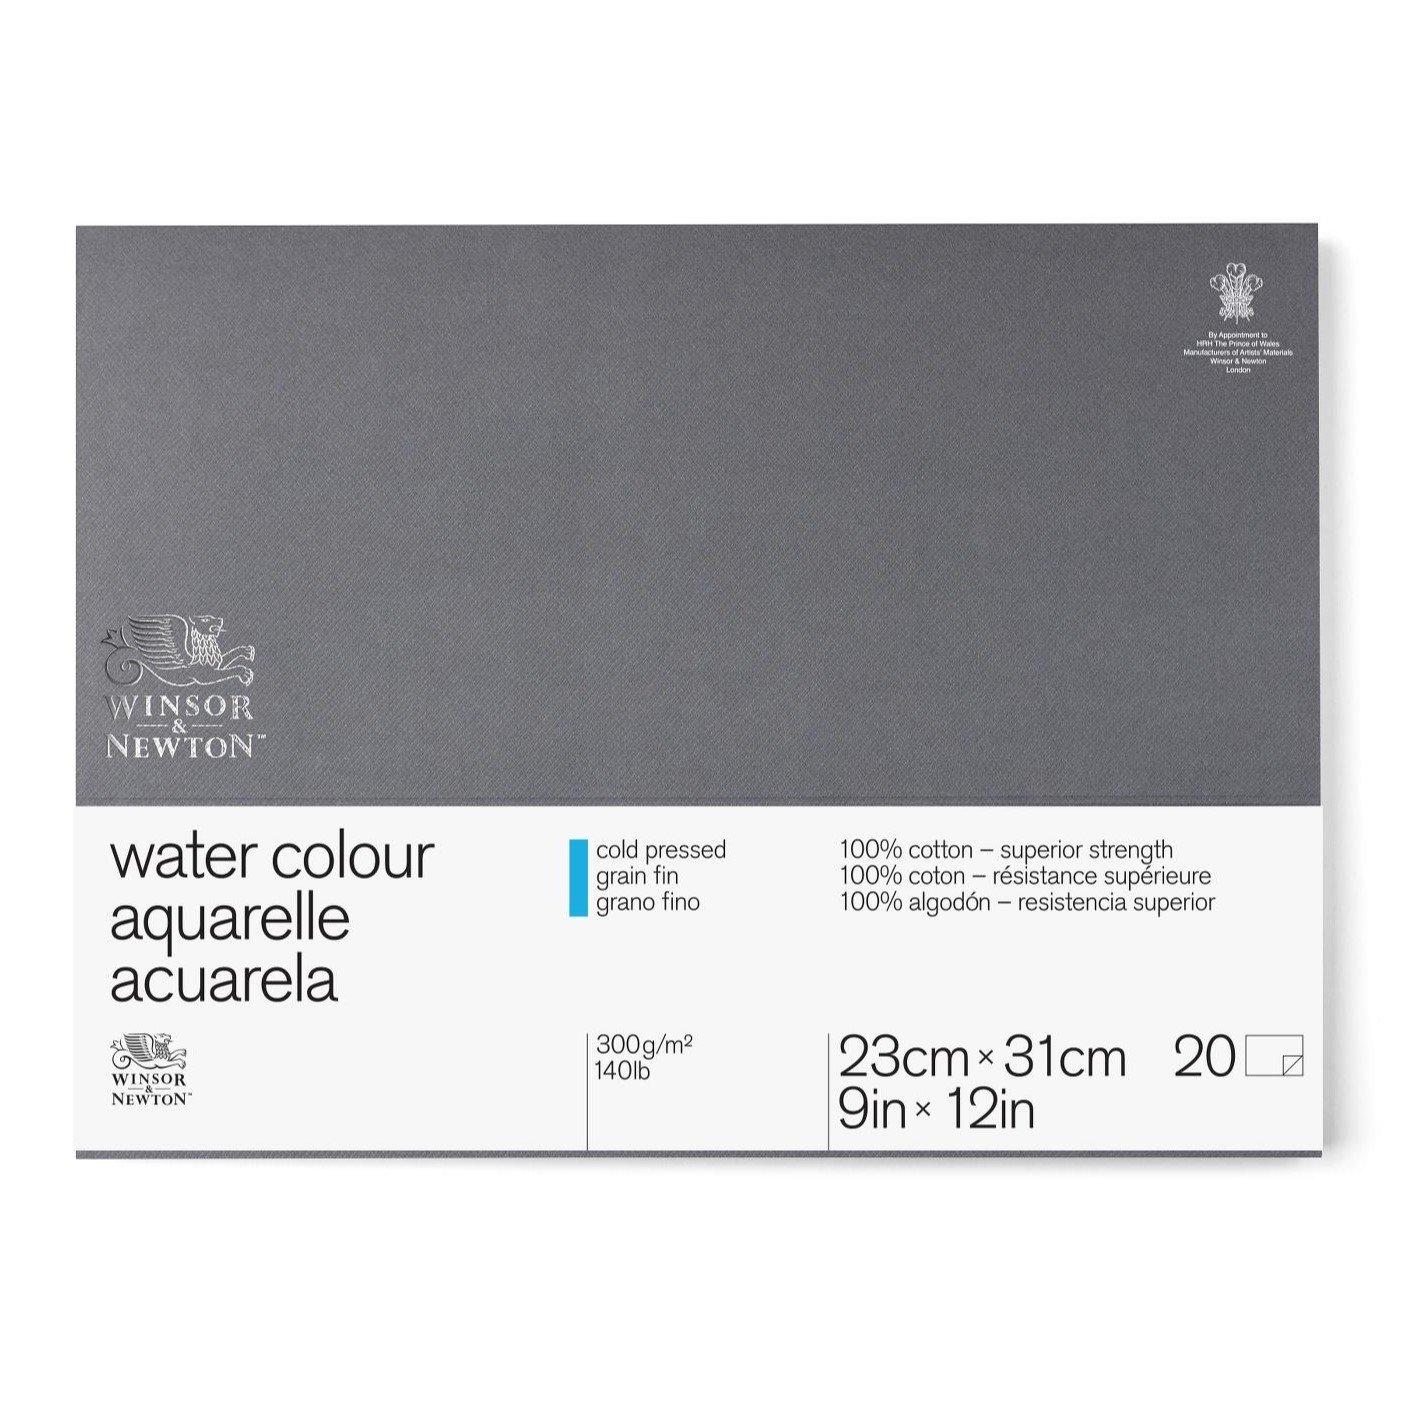 Winsor & Newton Professional Watercolor Paper Block, Cold Pressed 140lb, 9''x12'' by Winsor & Newton